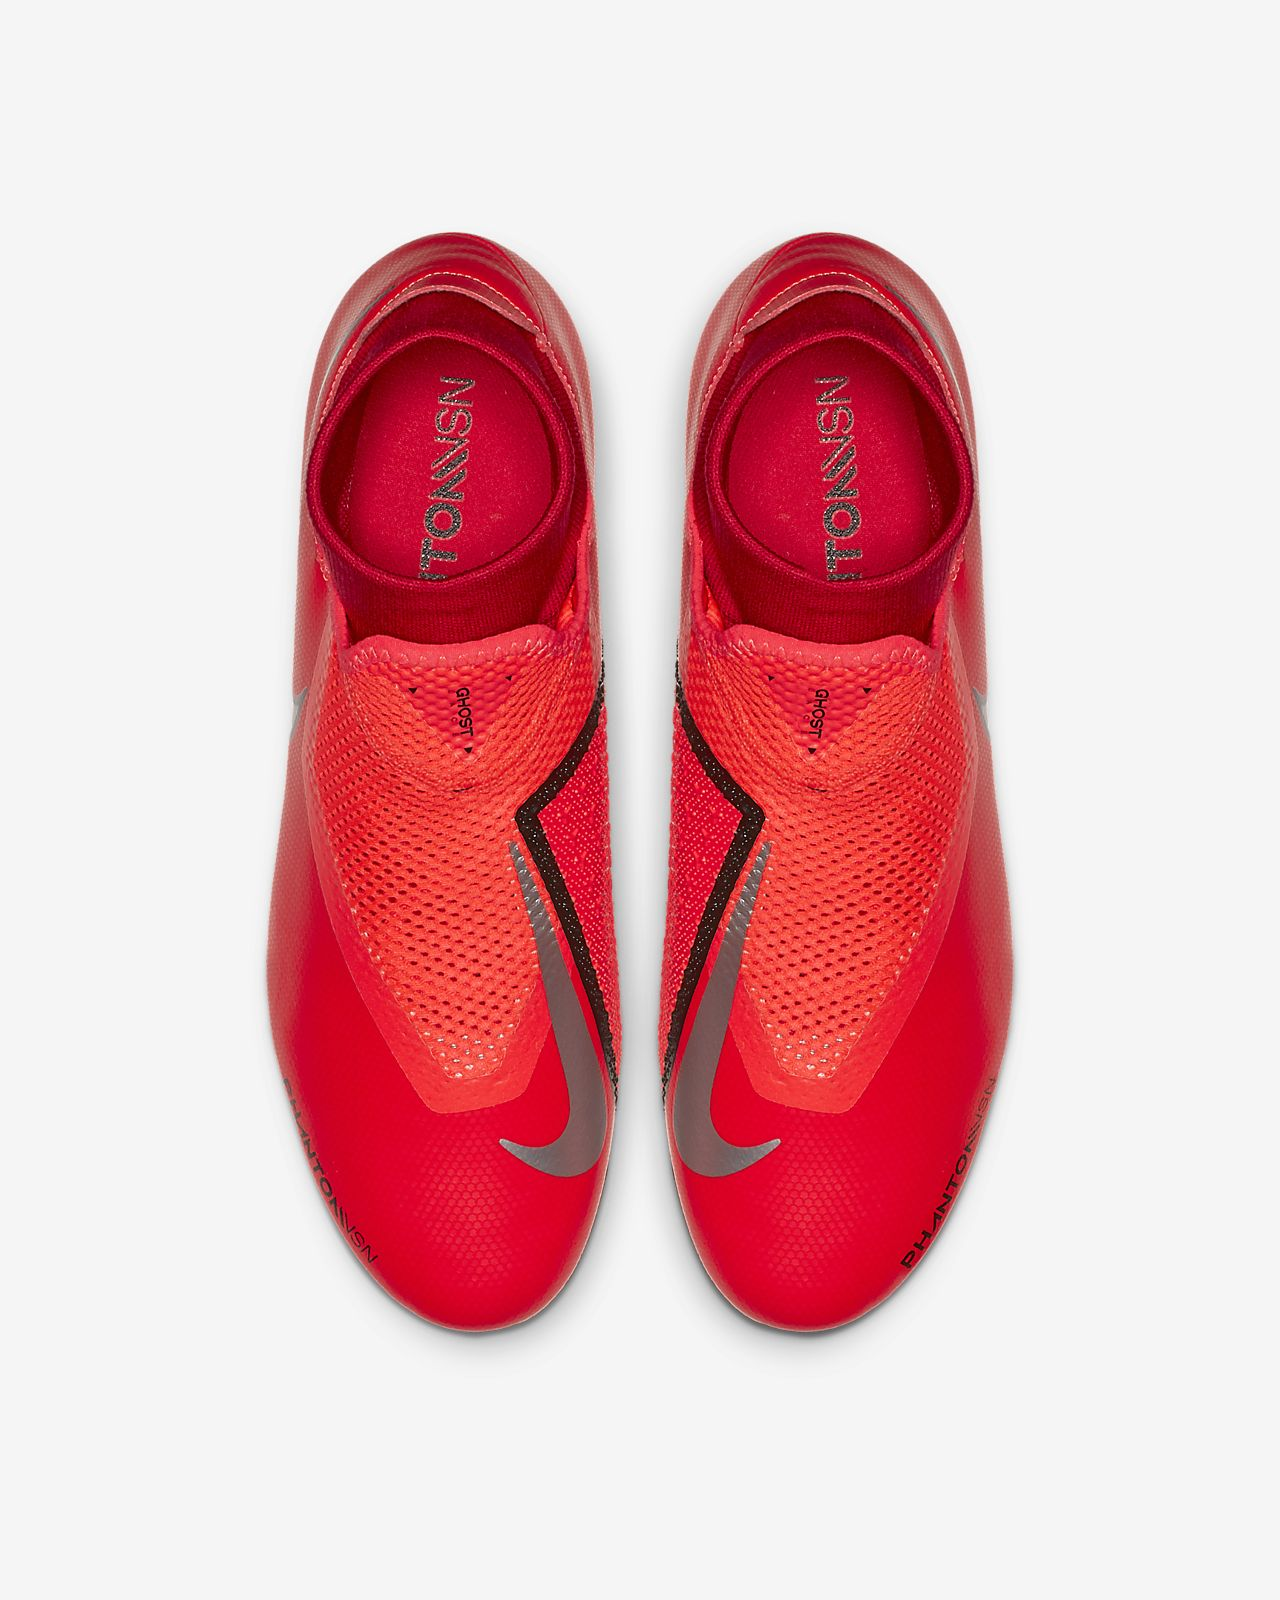 98dd8abd771d ... Nike PhantomVSN Academy Dynamic Fit Game Over MG Multi-Ground Football  Boot